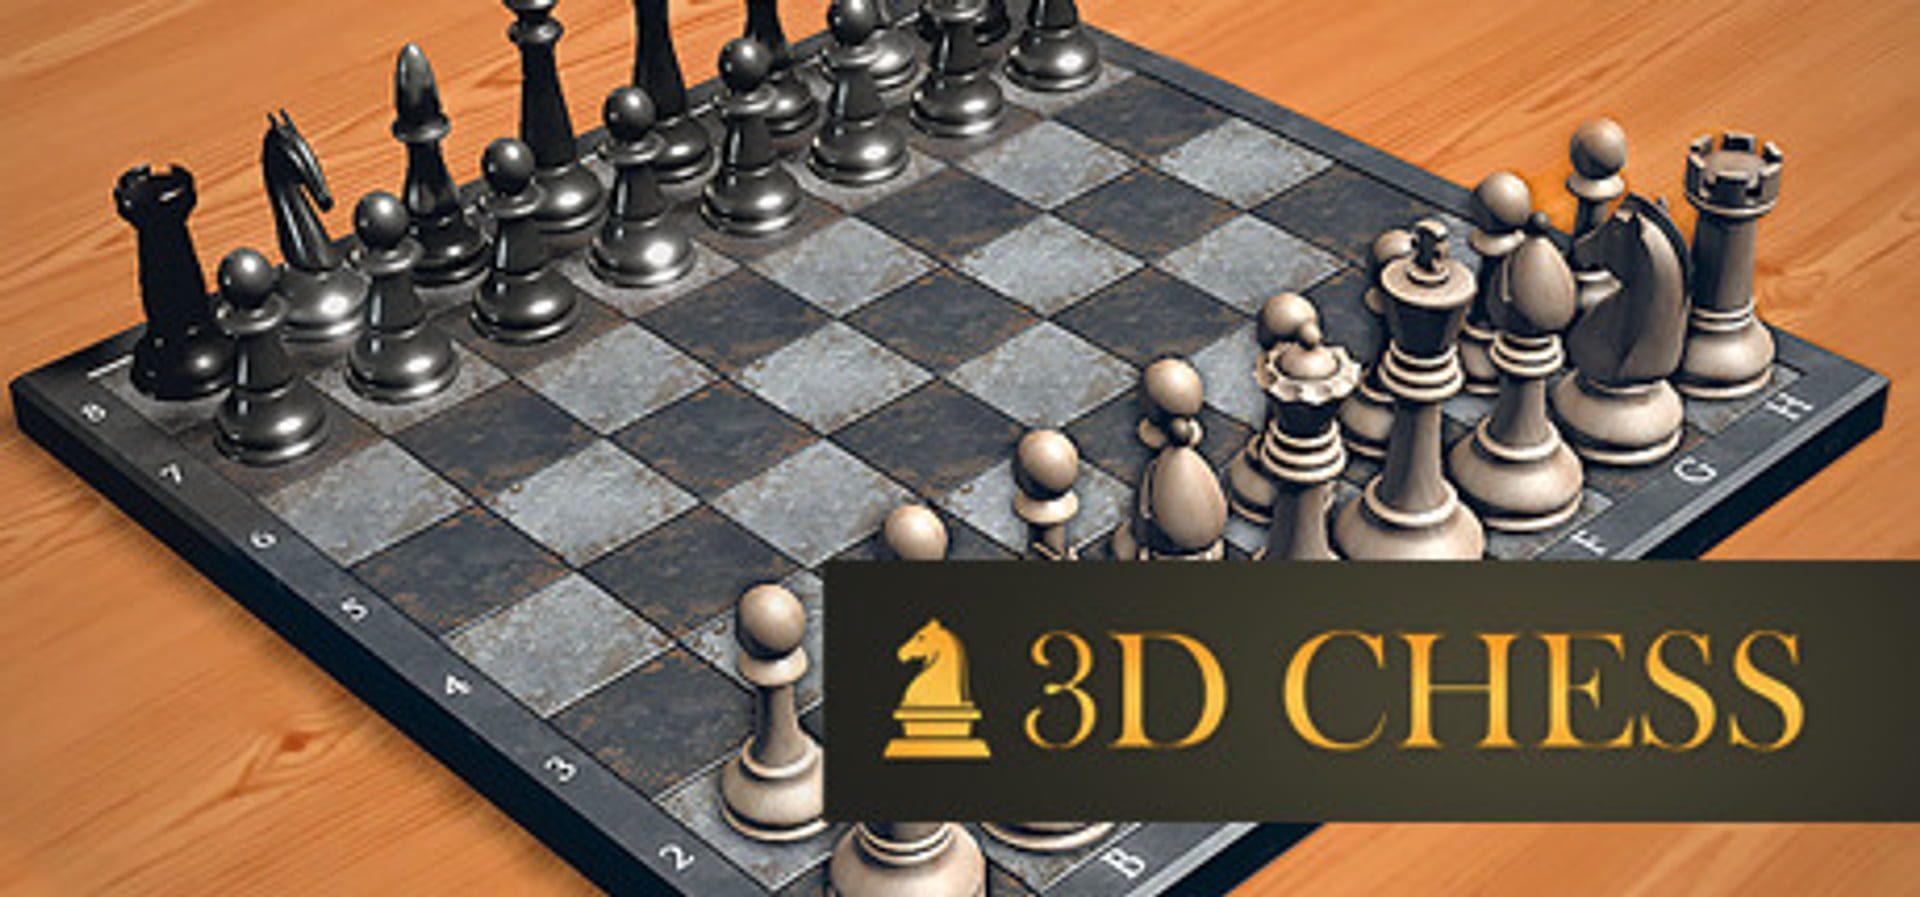 buy 3D Chess cd key for pc platform